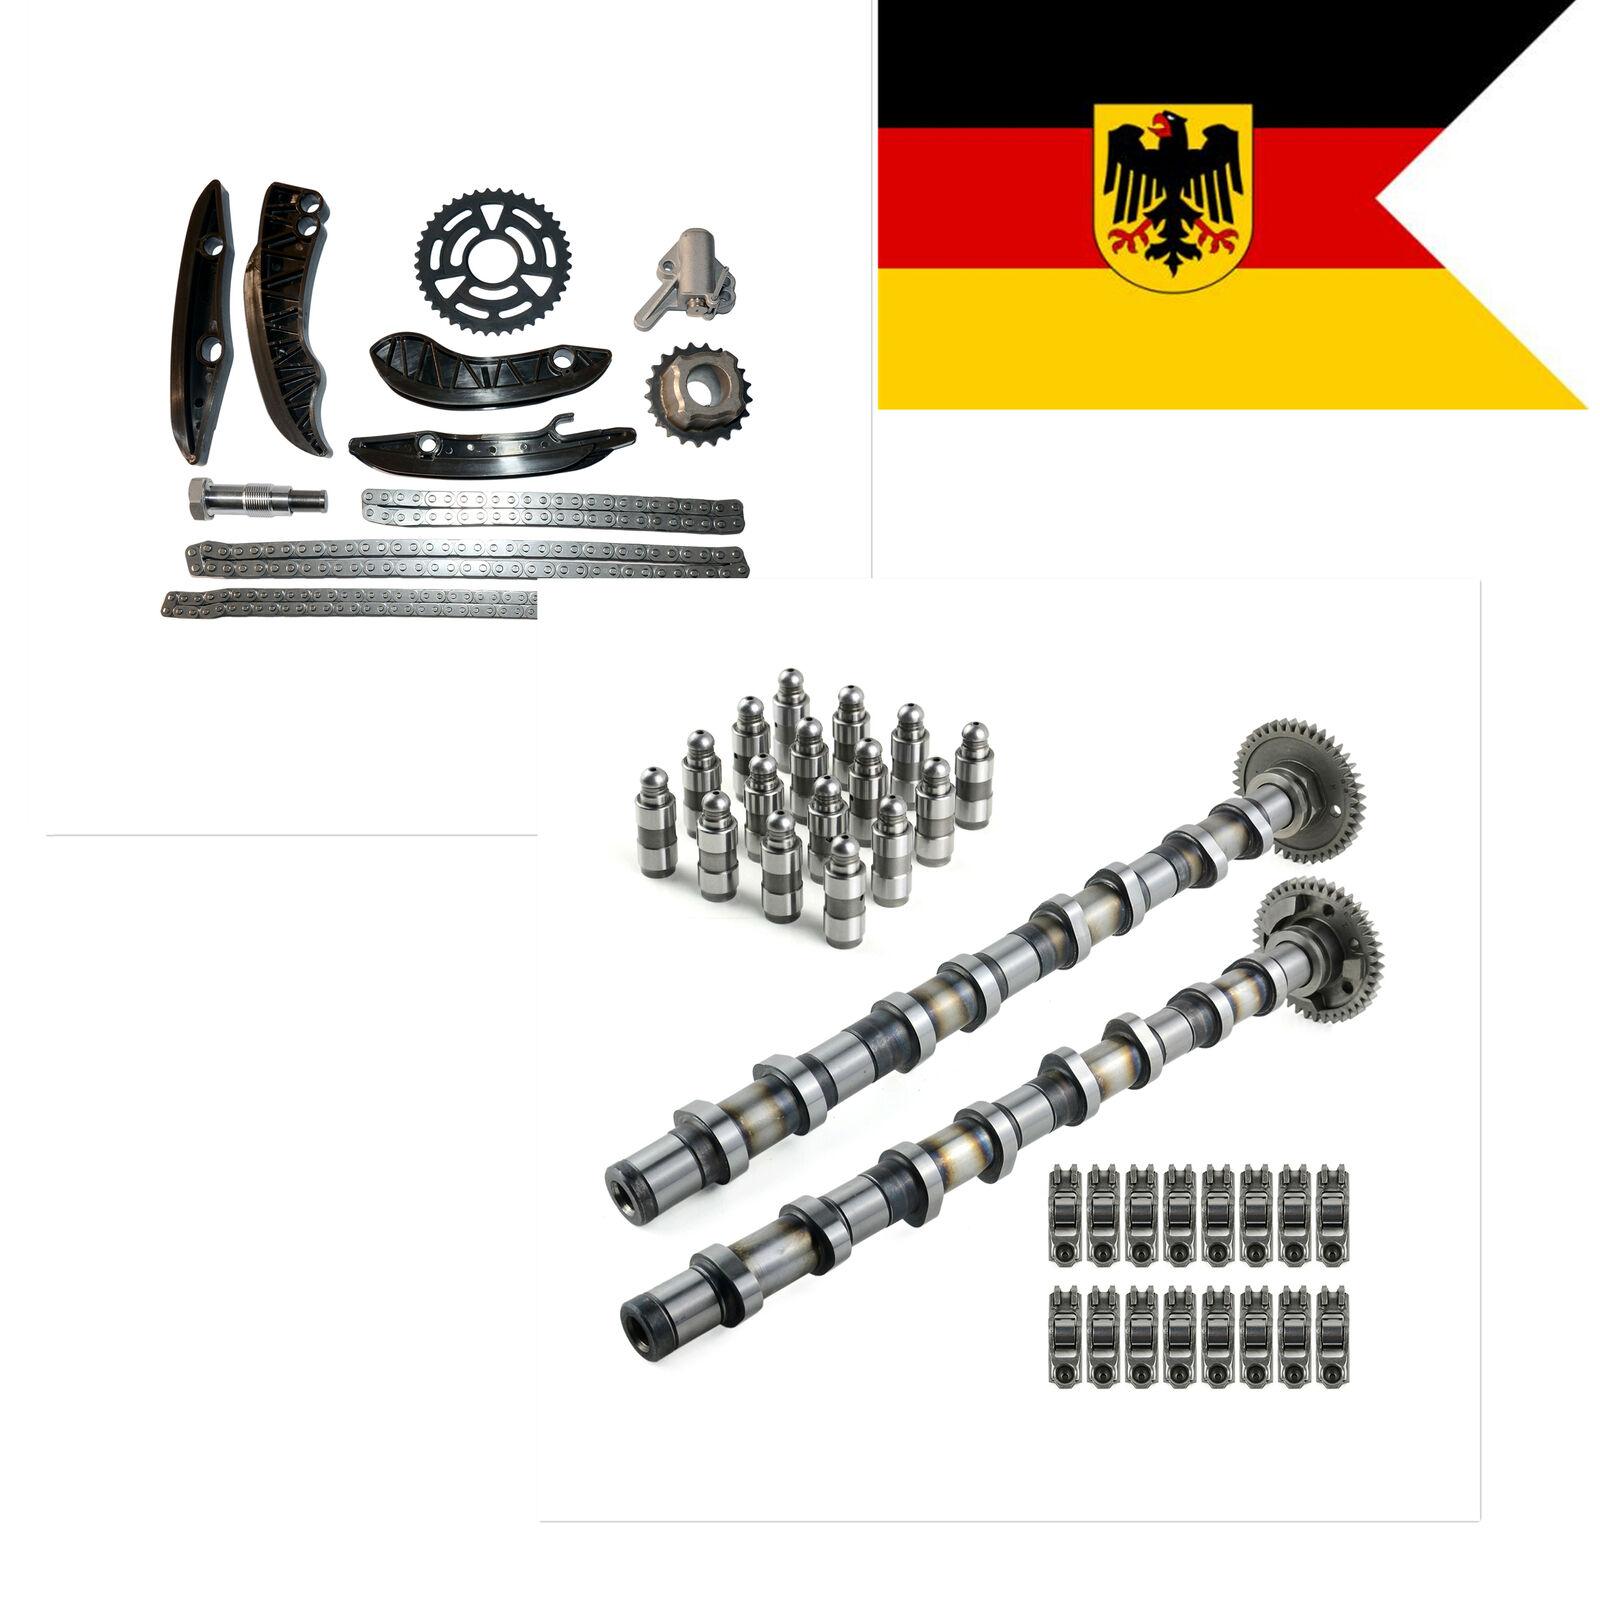 AP03 عمود الحدبات كيت + مجموعة أدوات سلسلة التوقيت N47 ل BMW 1 ، 3 ، 5 ، X1 ، X3 N47D20C N47D20B